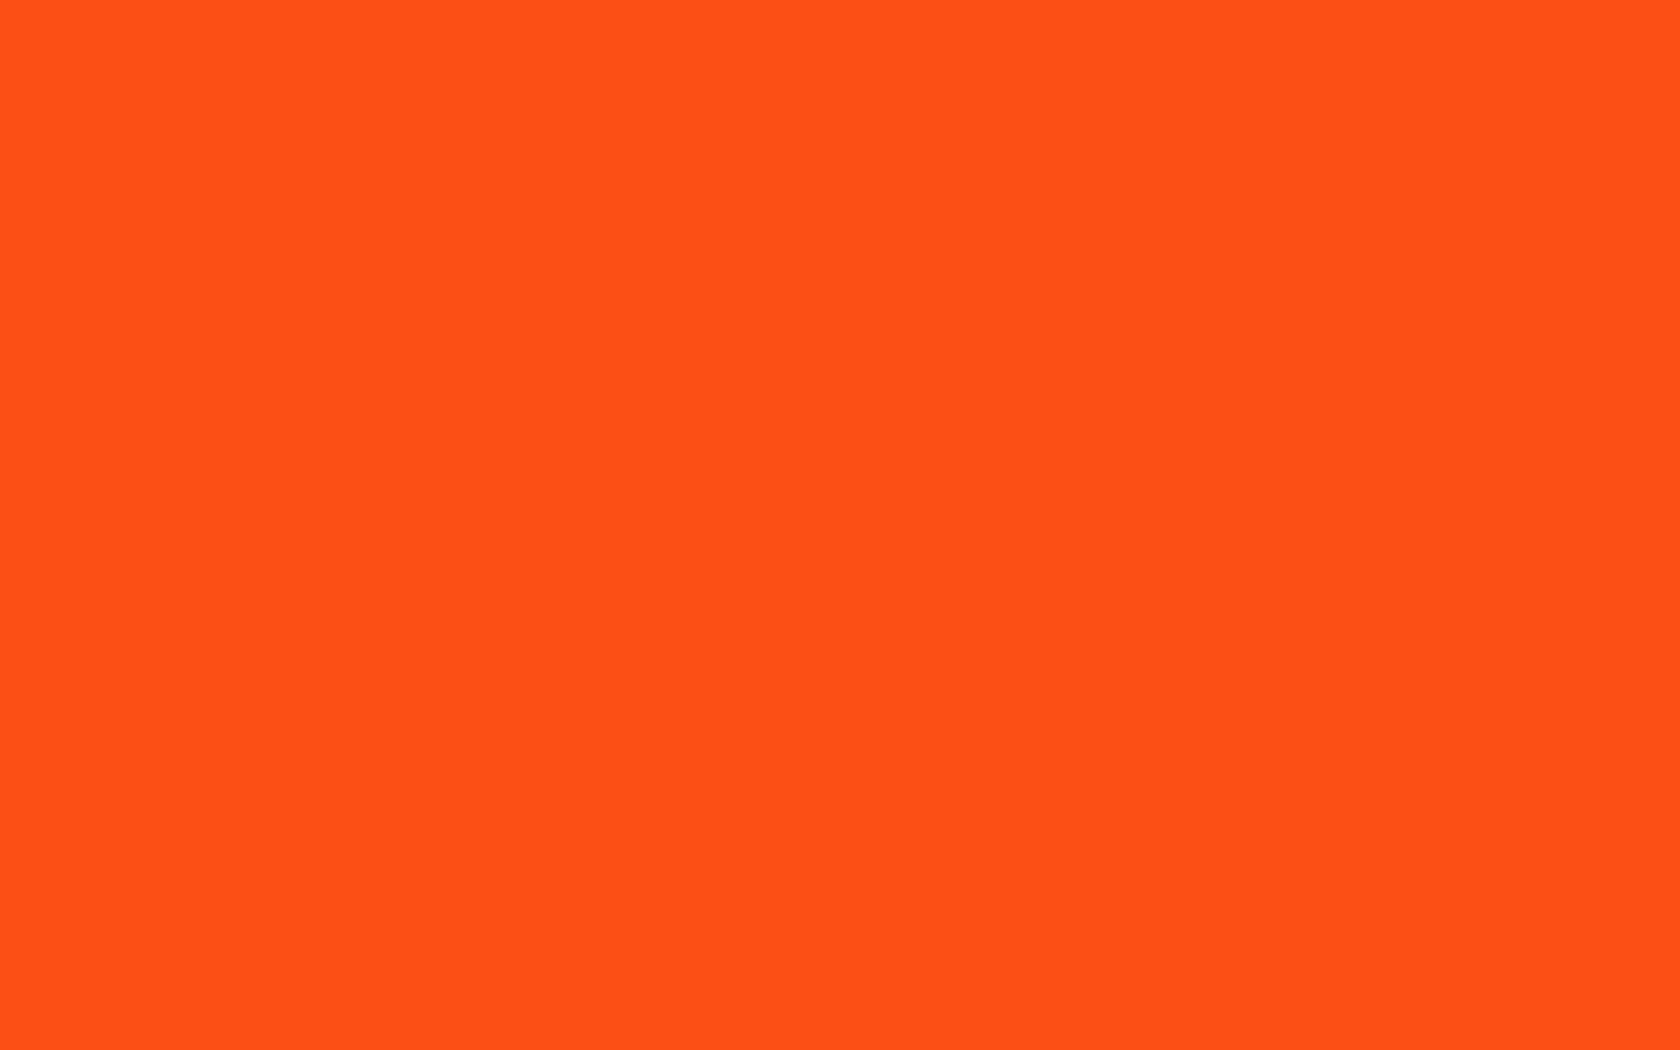 1680x1050 Orioles Orange Solid Color Background